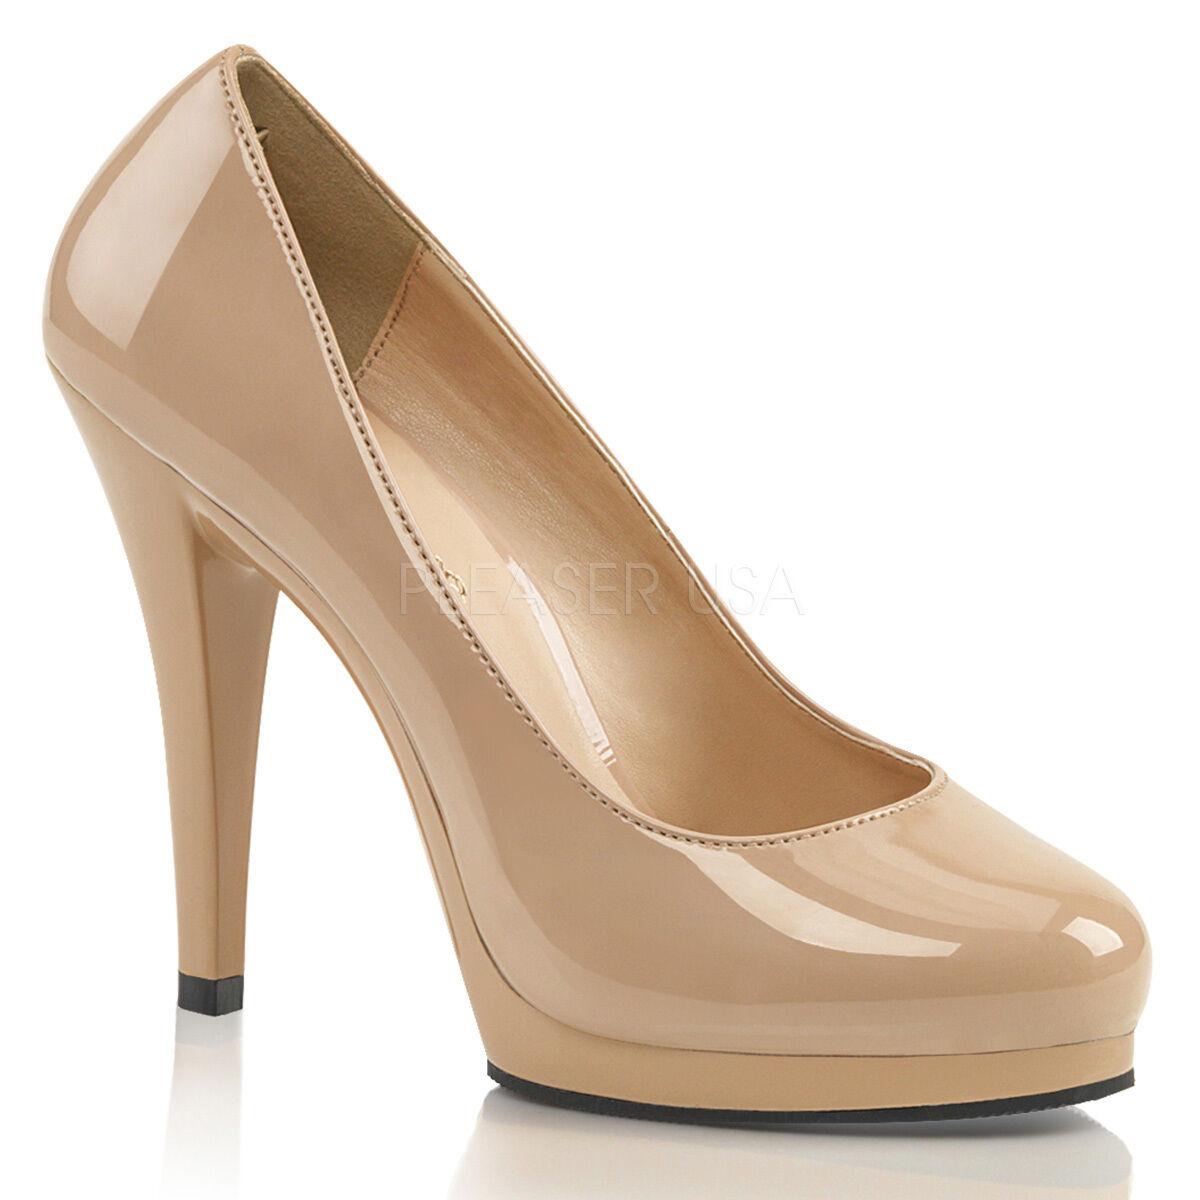 Liebling FLAIR 480 High Heel 3-13 Pumps transsexueller Transvestit Größen 3-13 Heel d561ae